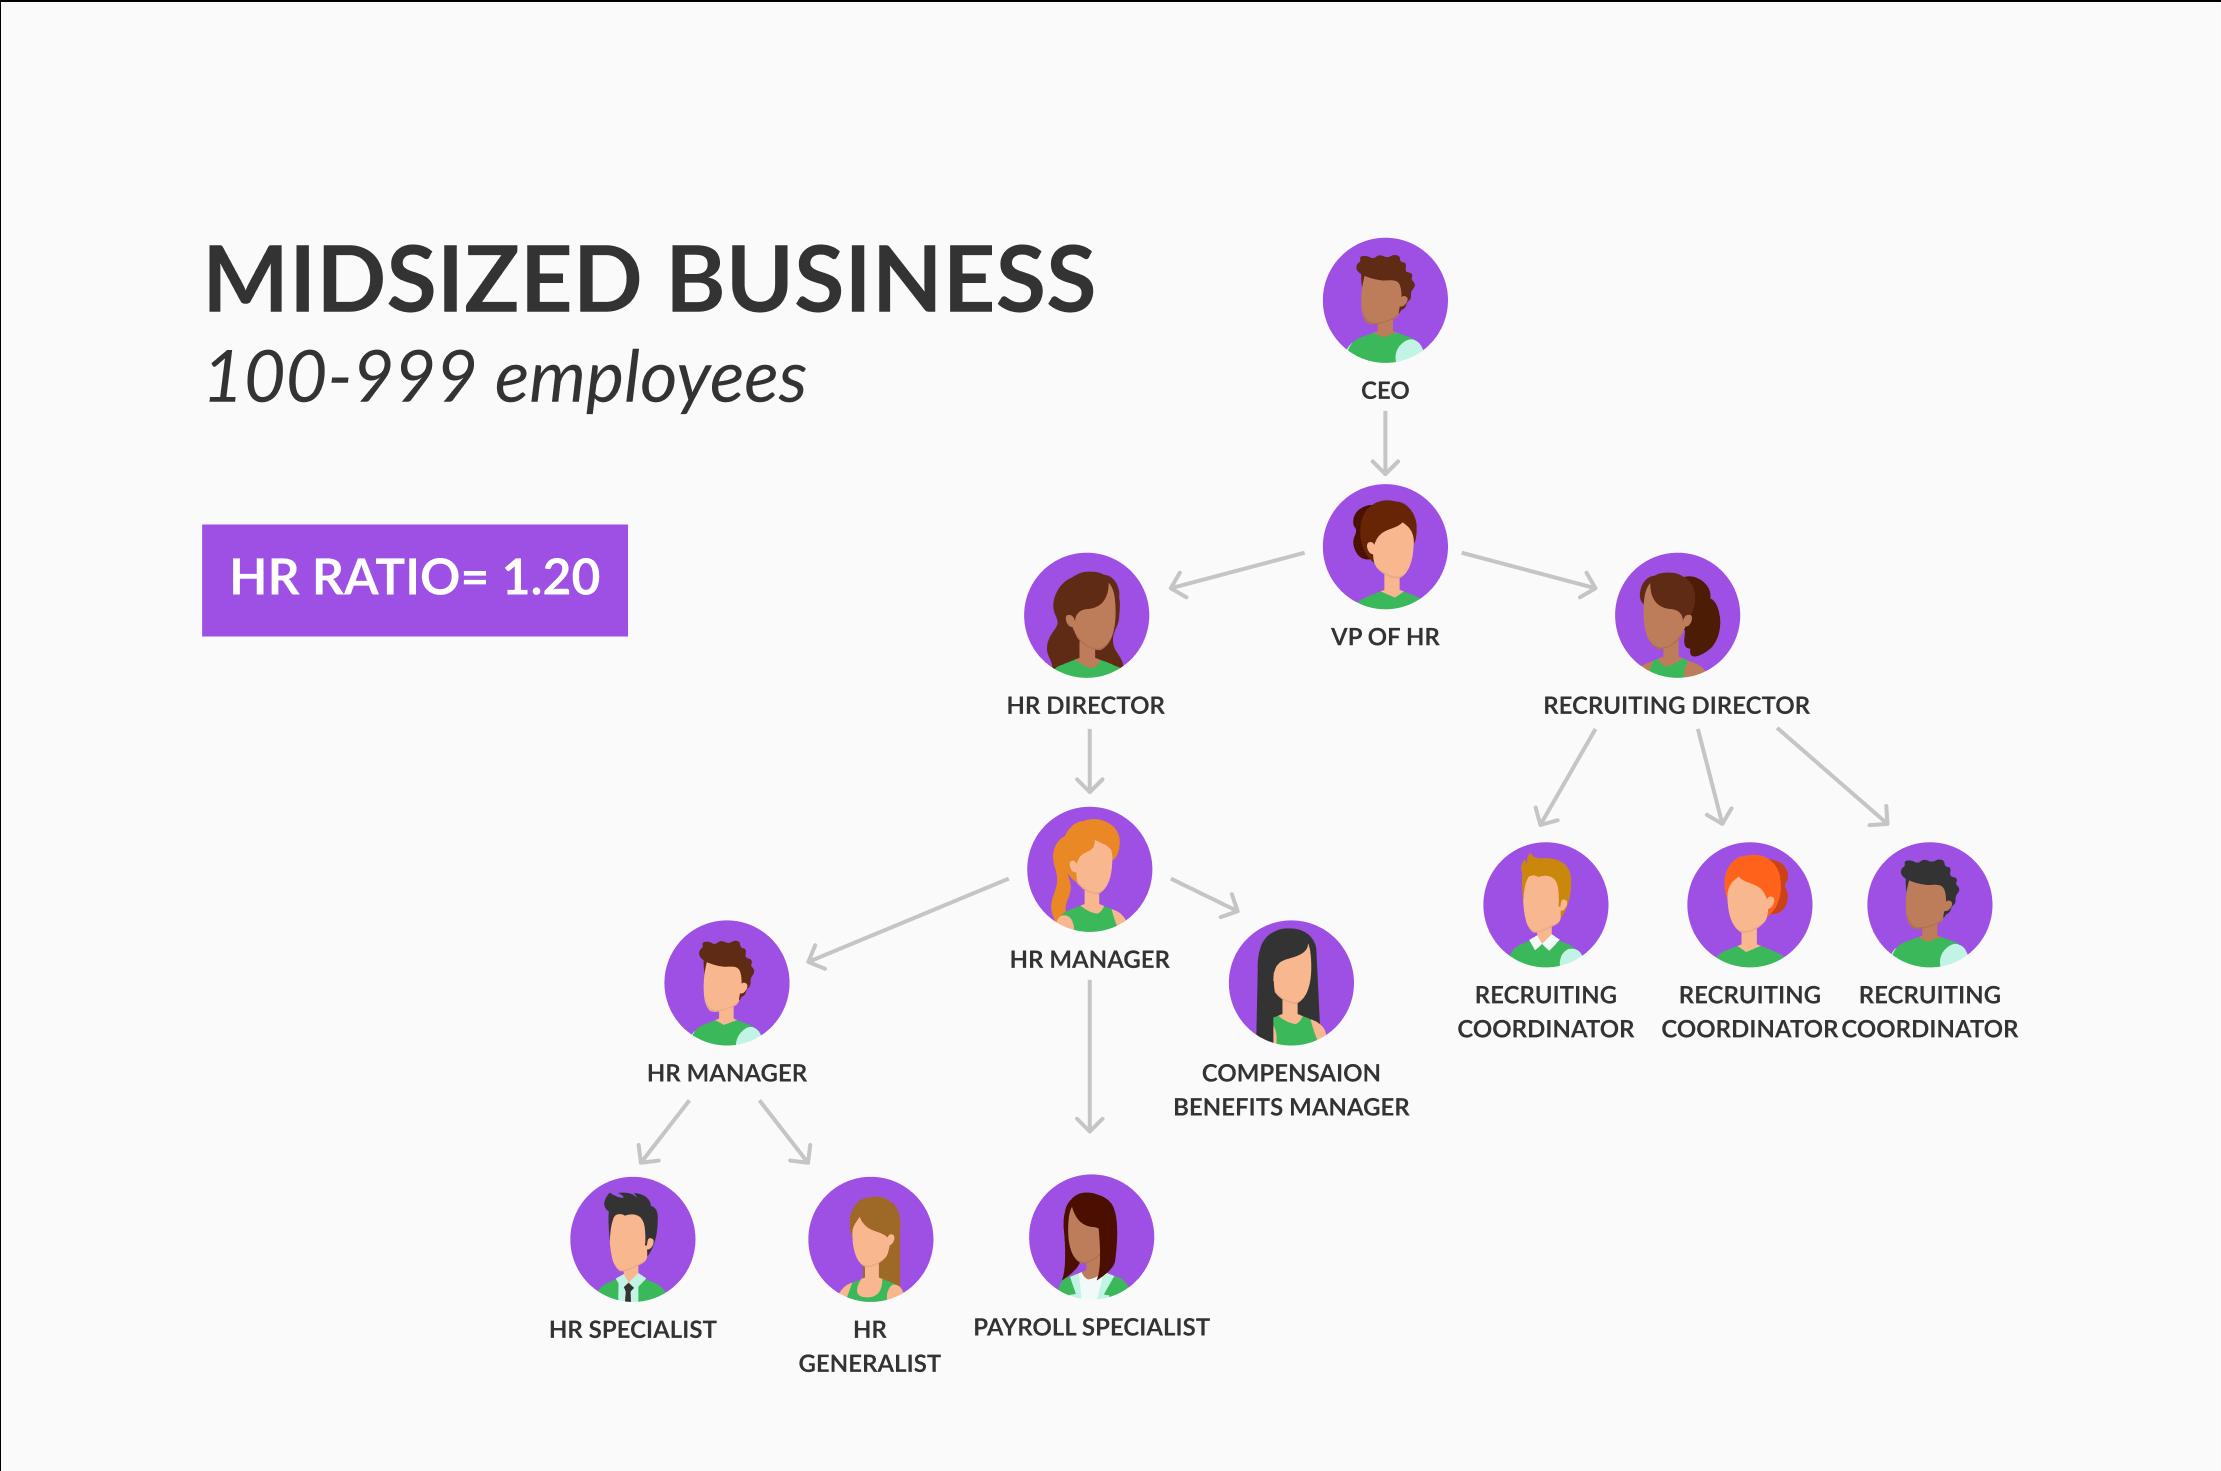 organization model for medium-sized companies